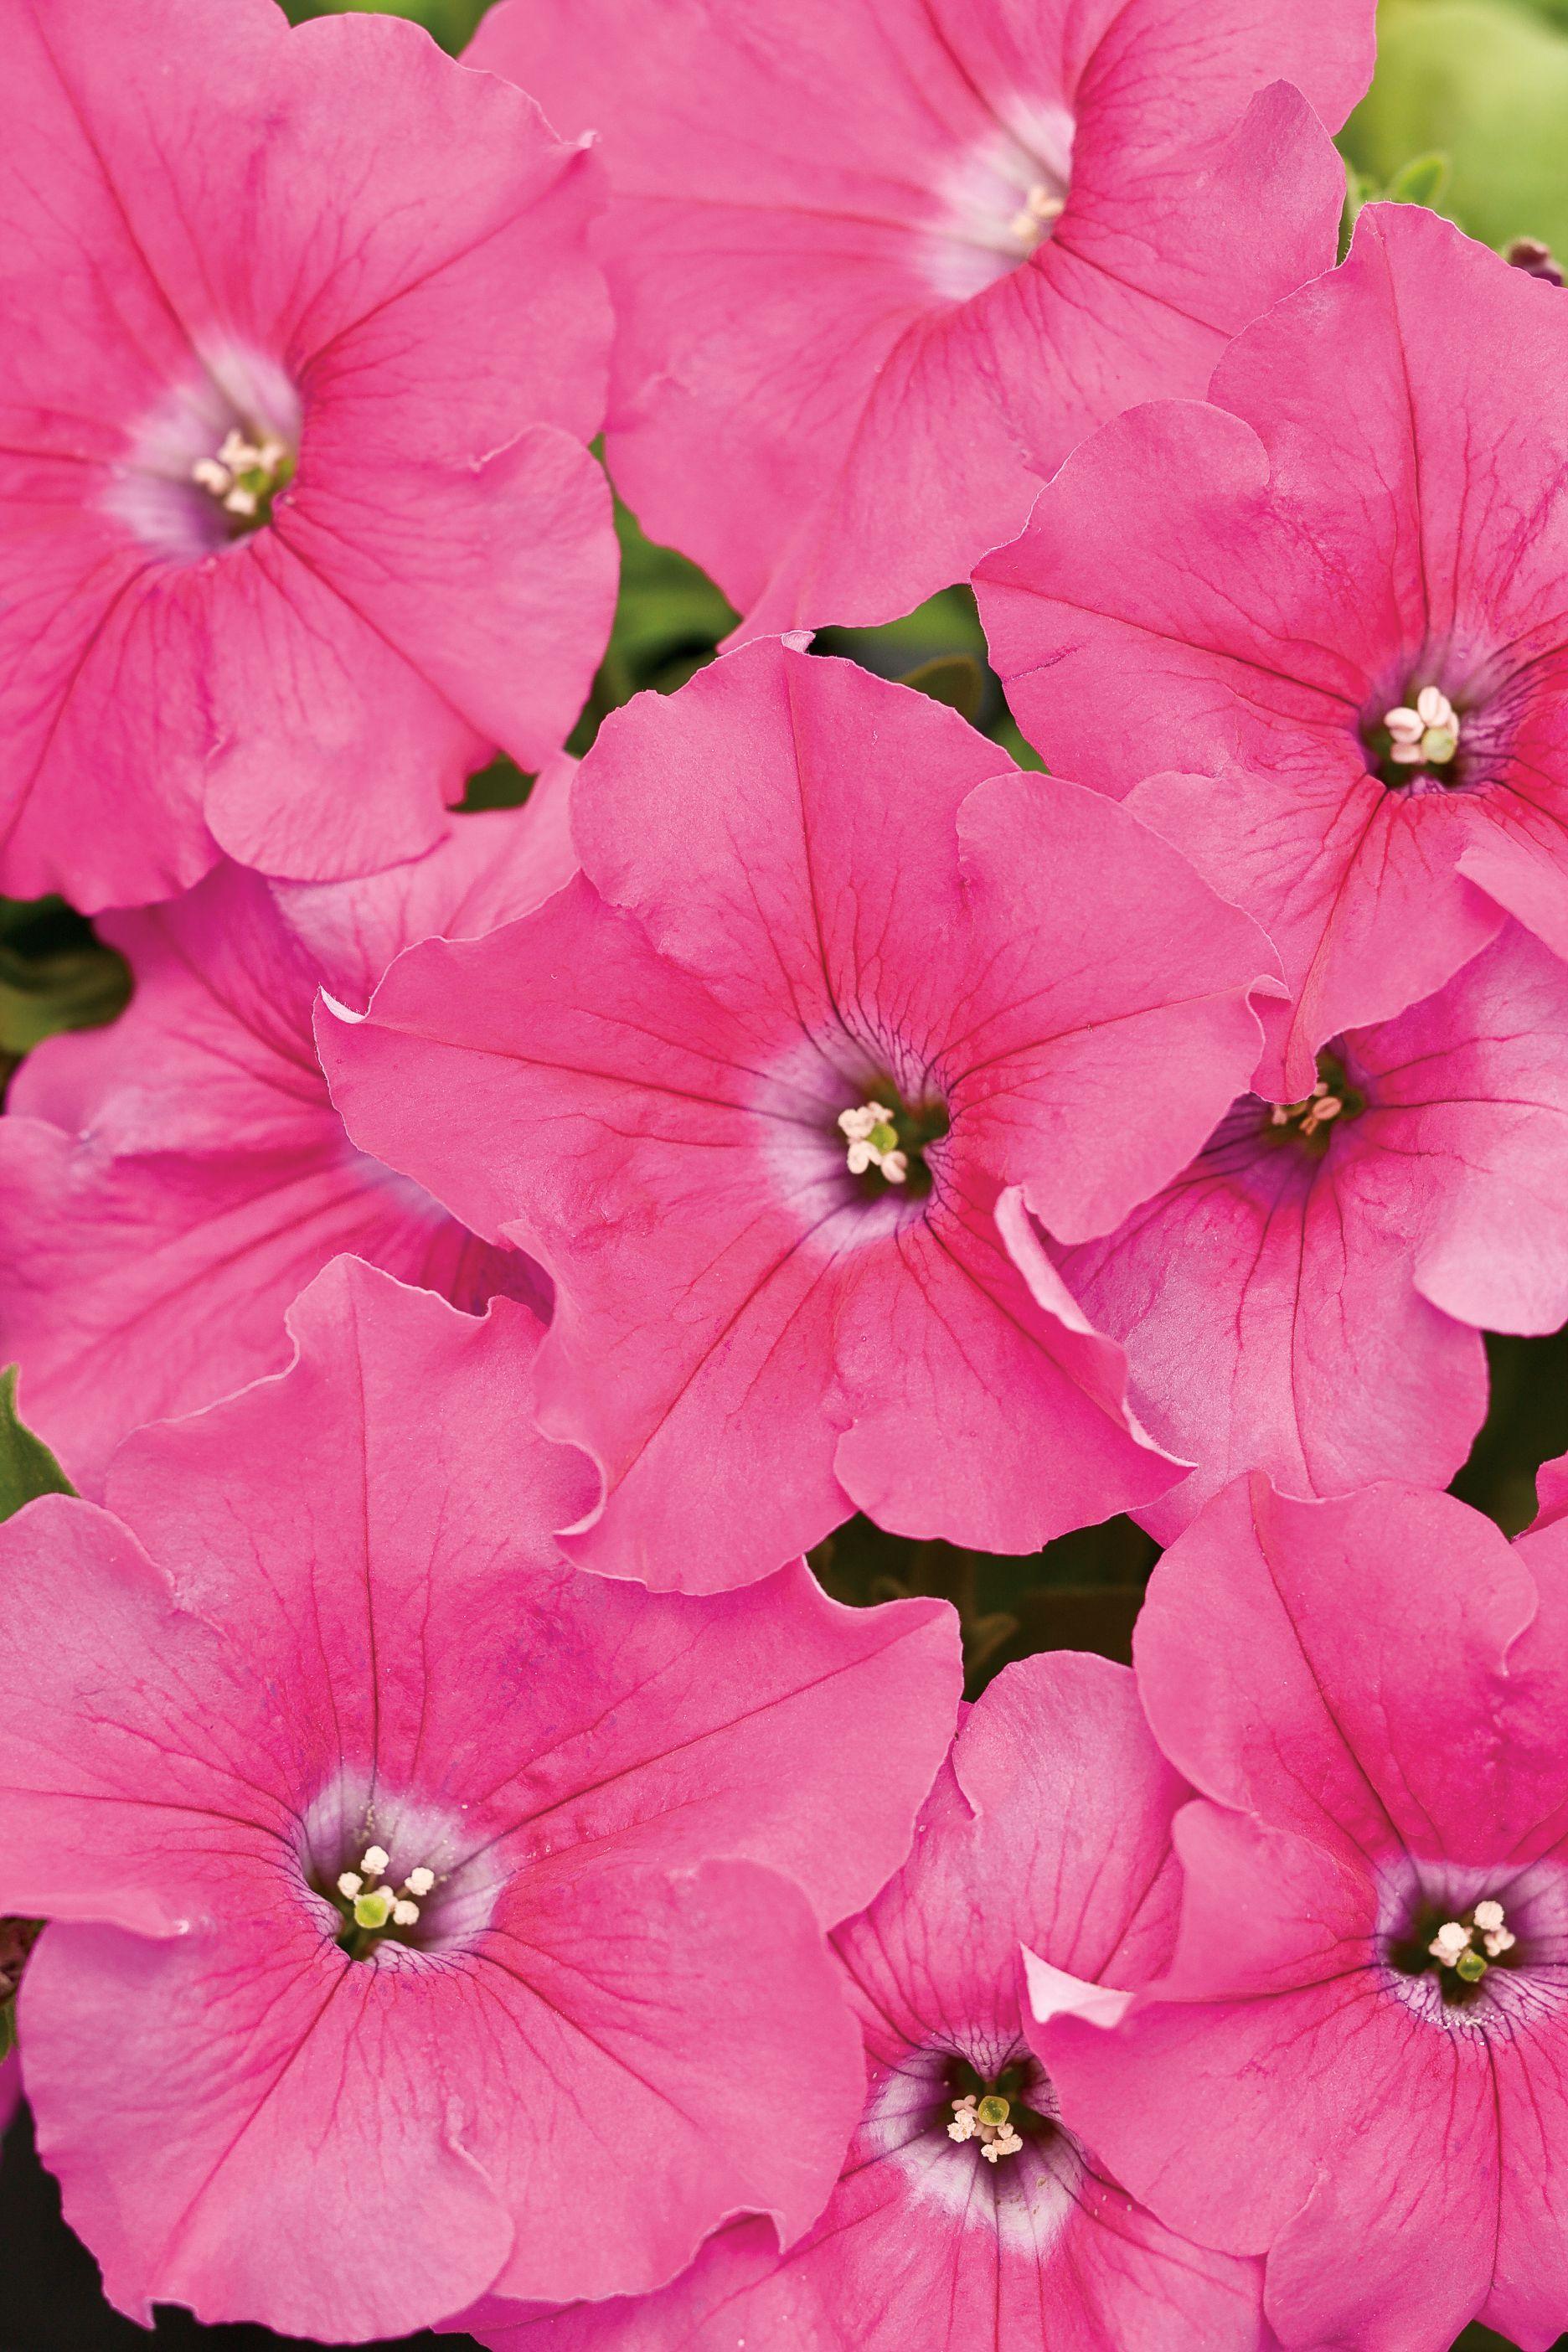 Supertunia Giant Pink Petunia Hybrid Petunias Flowering Bushes Pink Flower Tattoos